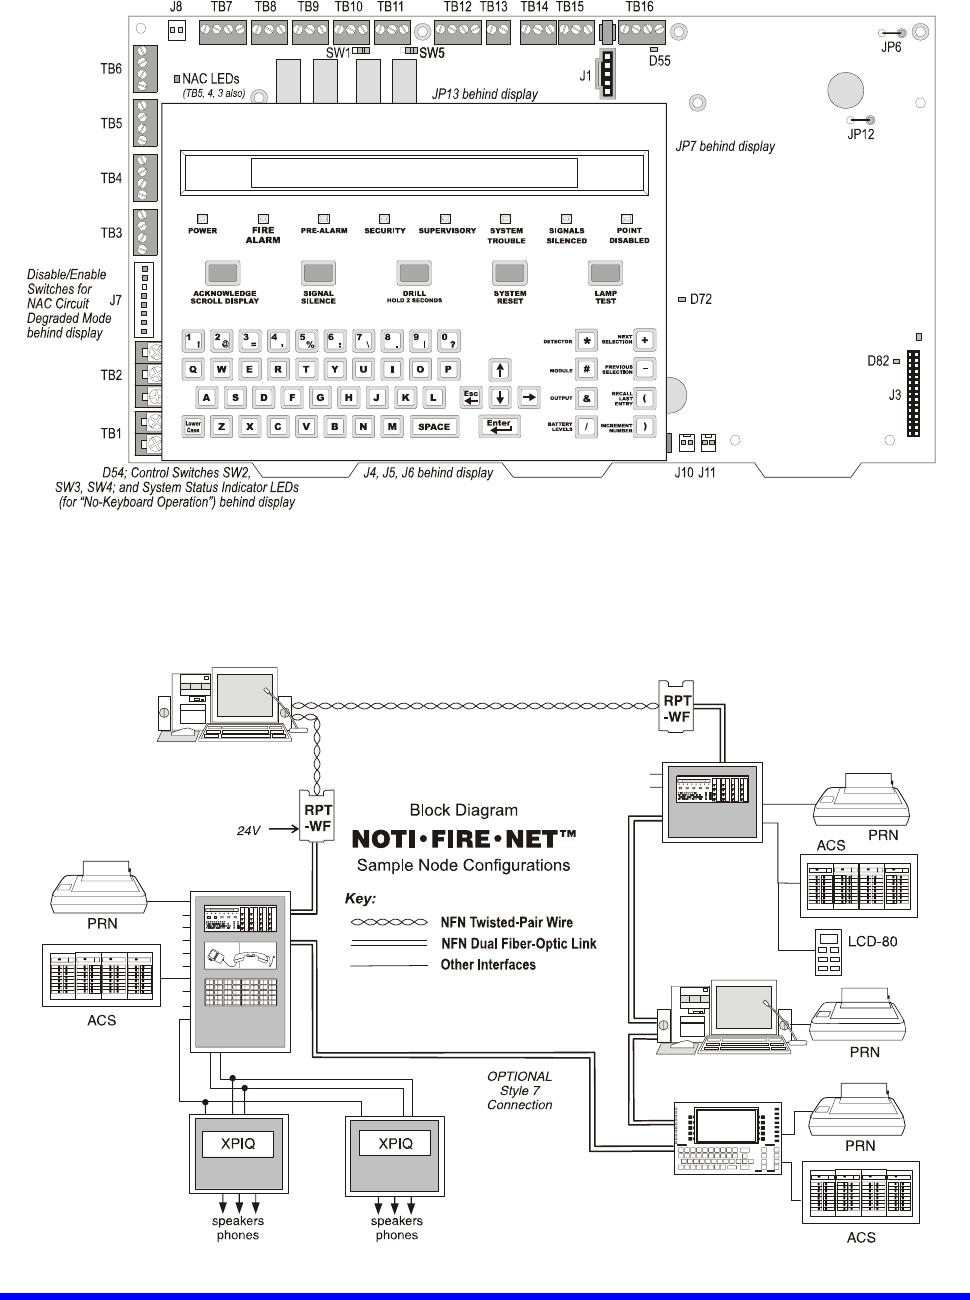 Johnson Controls Ifc 640 Users Manual Intelligent Addressable Fire ...